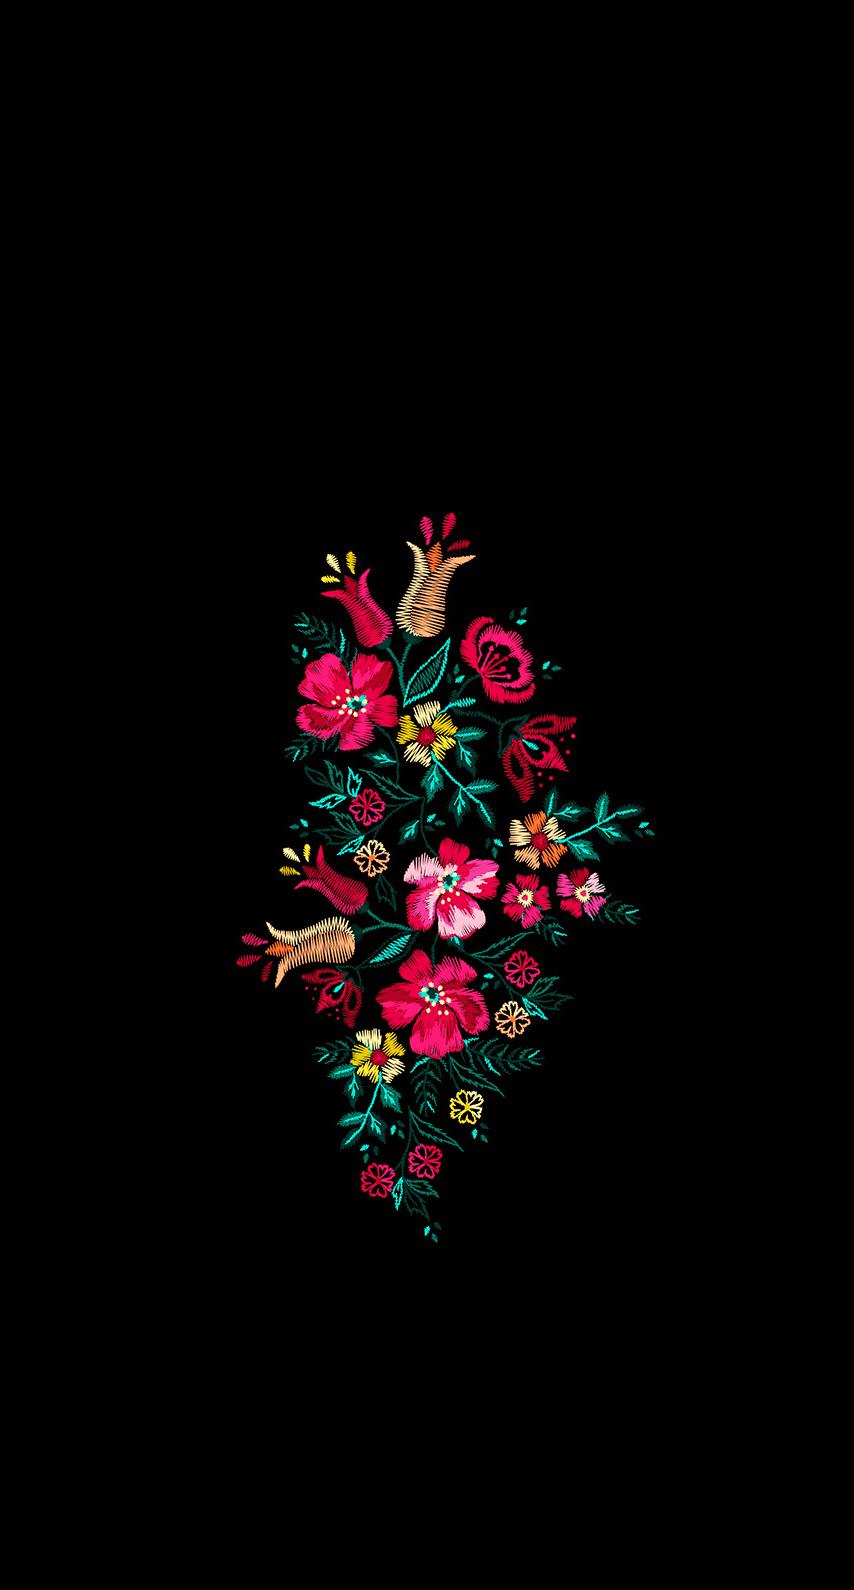 Black And Pink Flowers Mexico Wallpaper Cellphone Wallpaper Dark Wallpaper